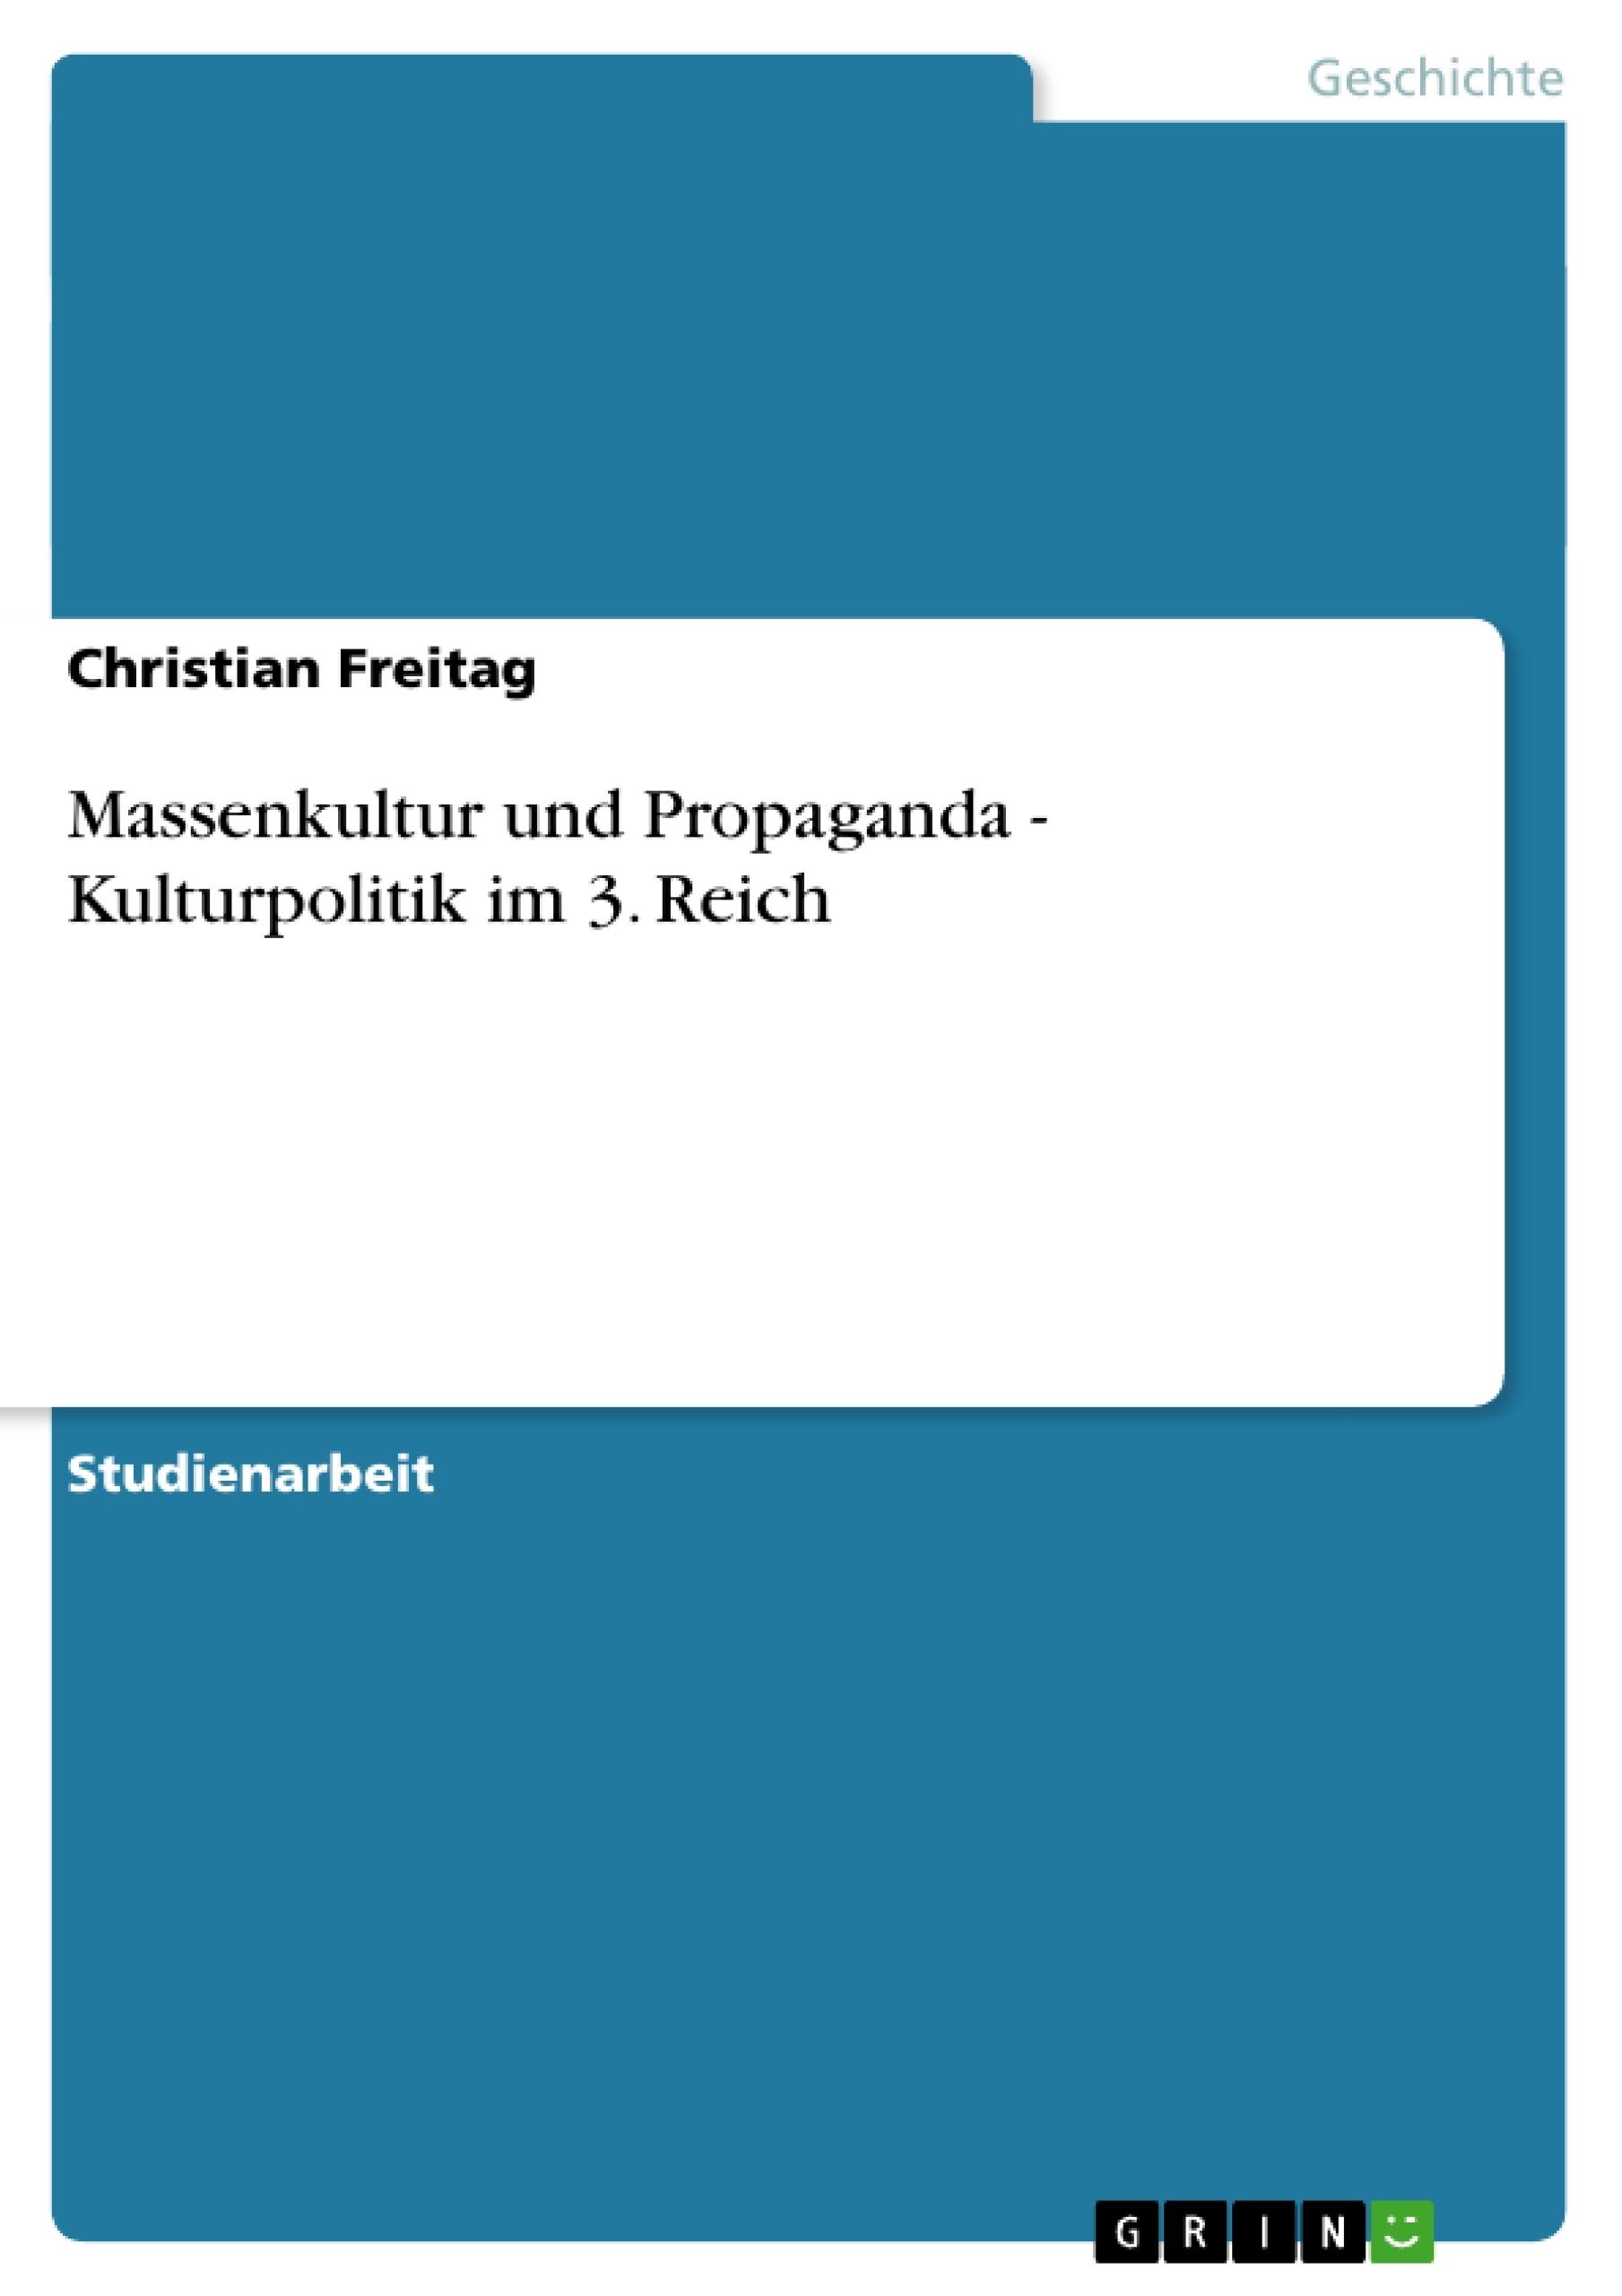 Titel: Massenkultur und Propaganda - Kulturpolitik im 3. Reich